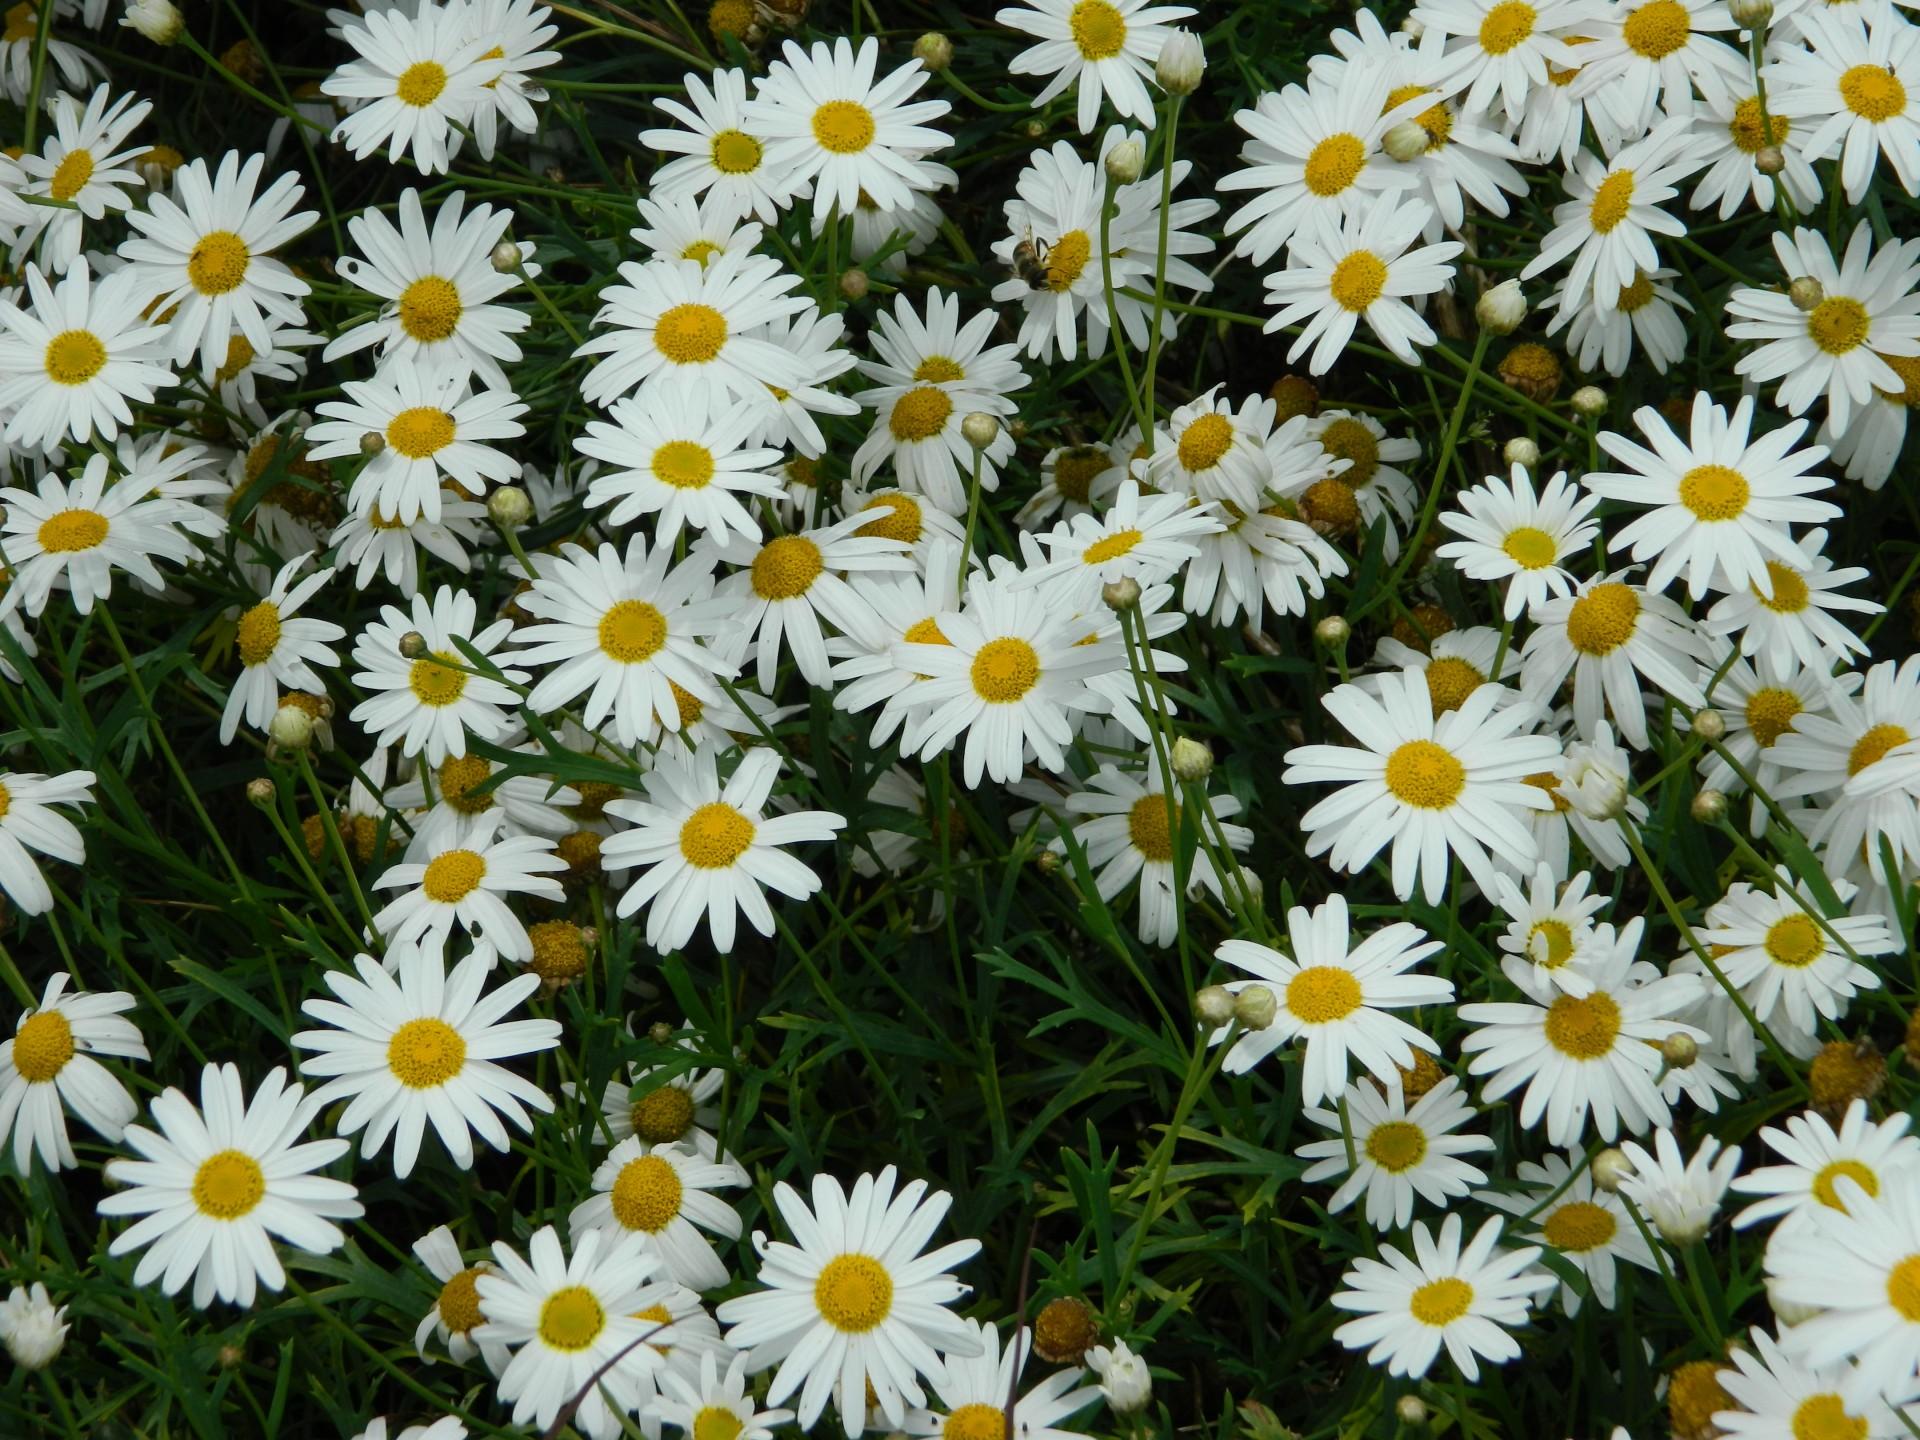 Image white daisy flowers 1383946488ipkg hetalia fan white daisy flowers 1383946488ipkg izmirmasajfo